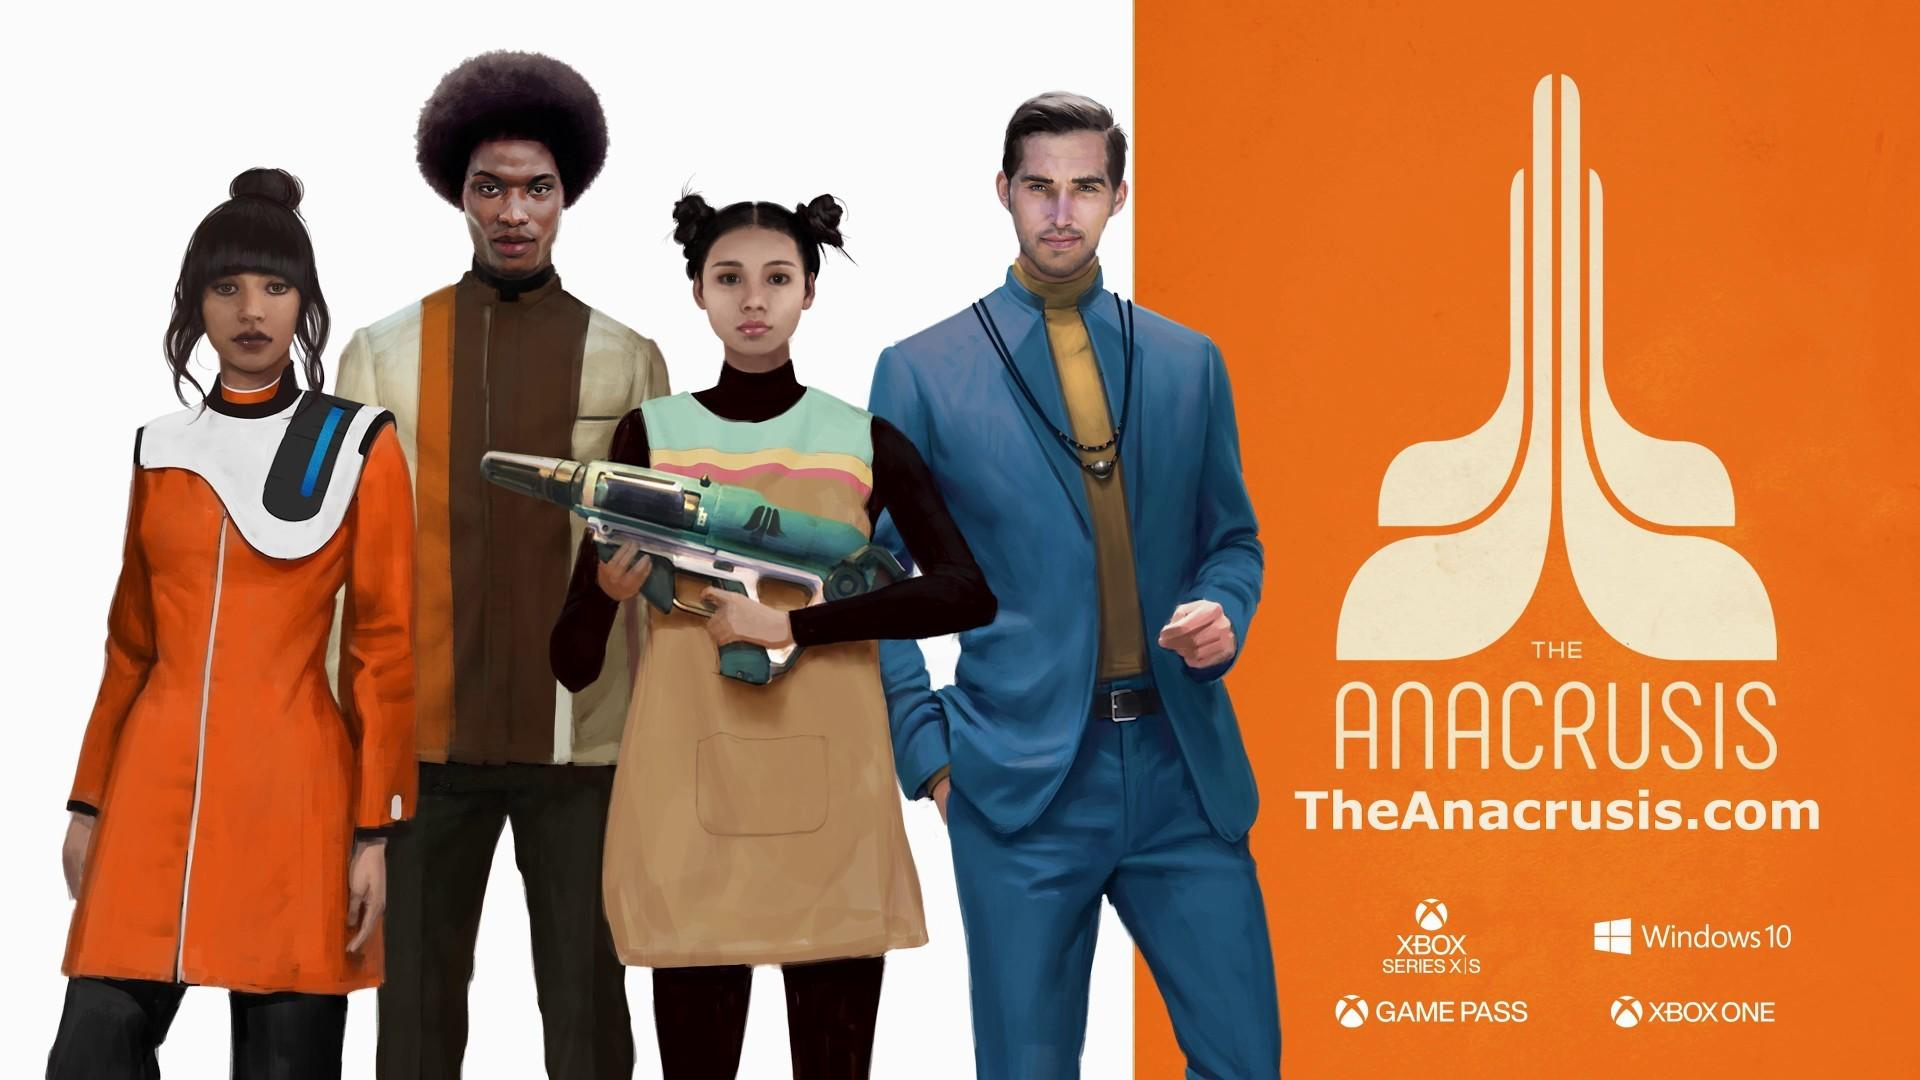 Состоялся анонс нового кооперативного проекта The Anacrusis 2